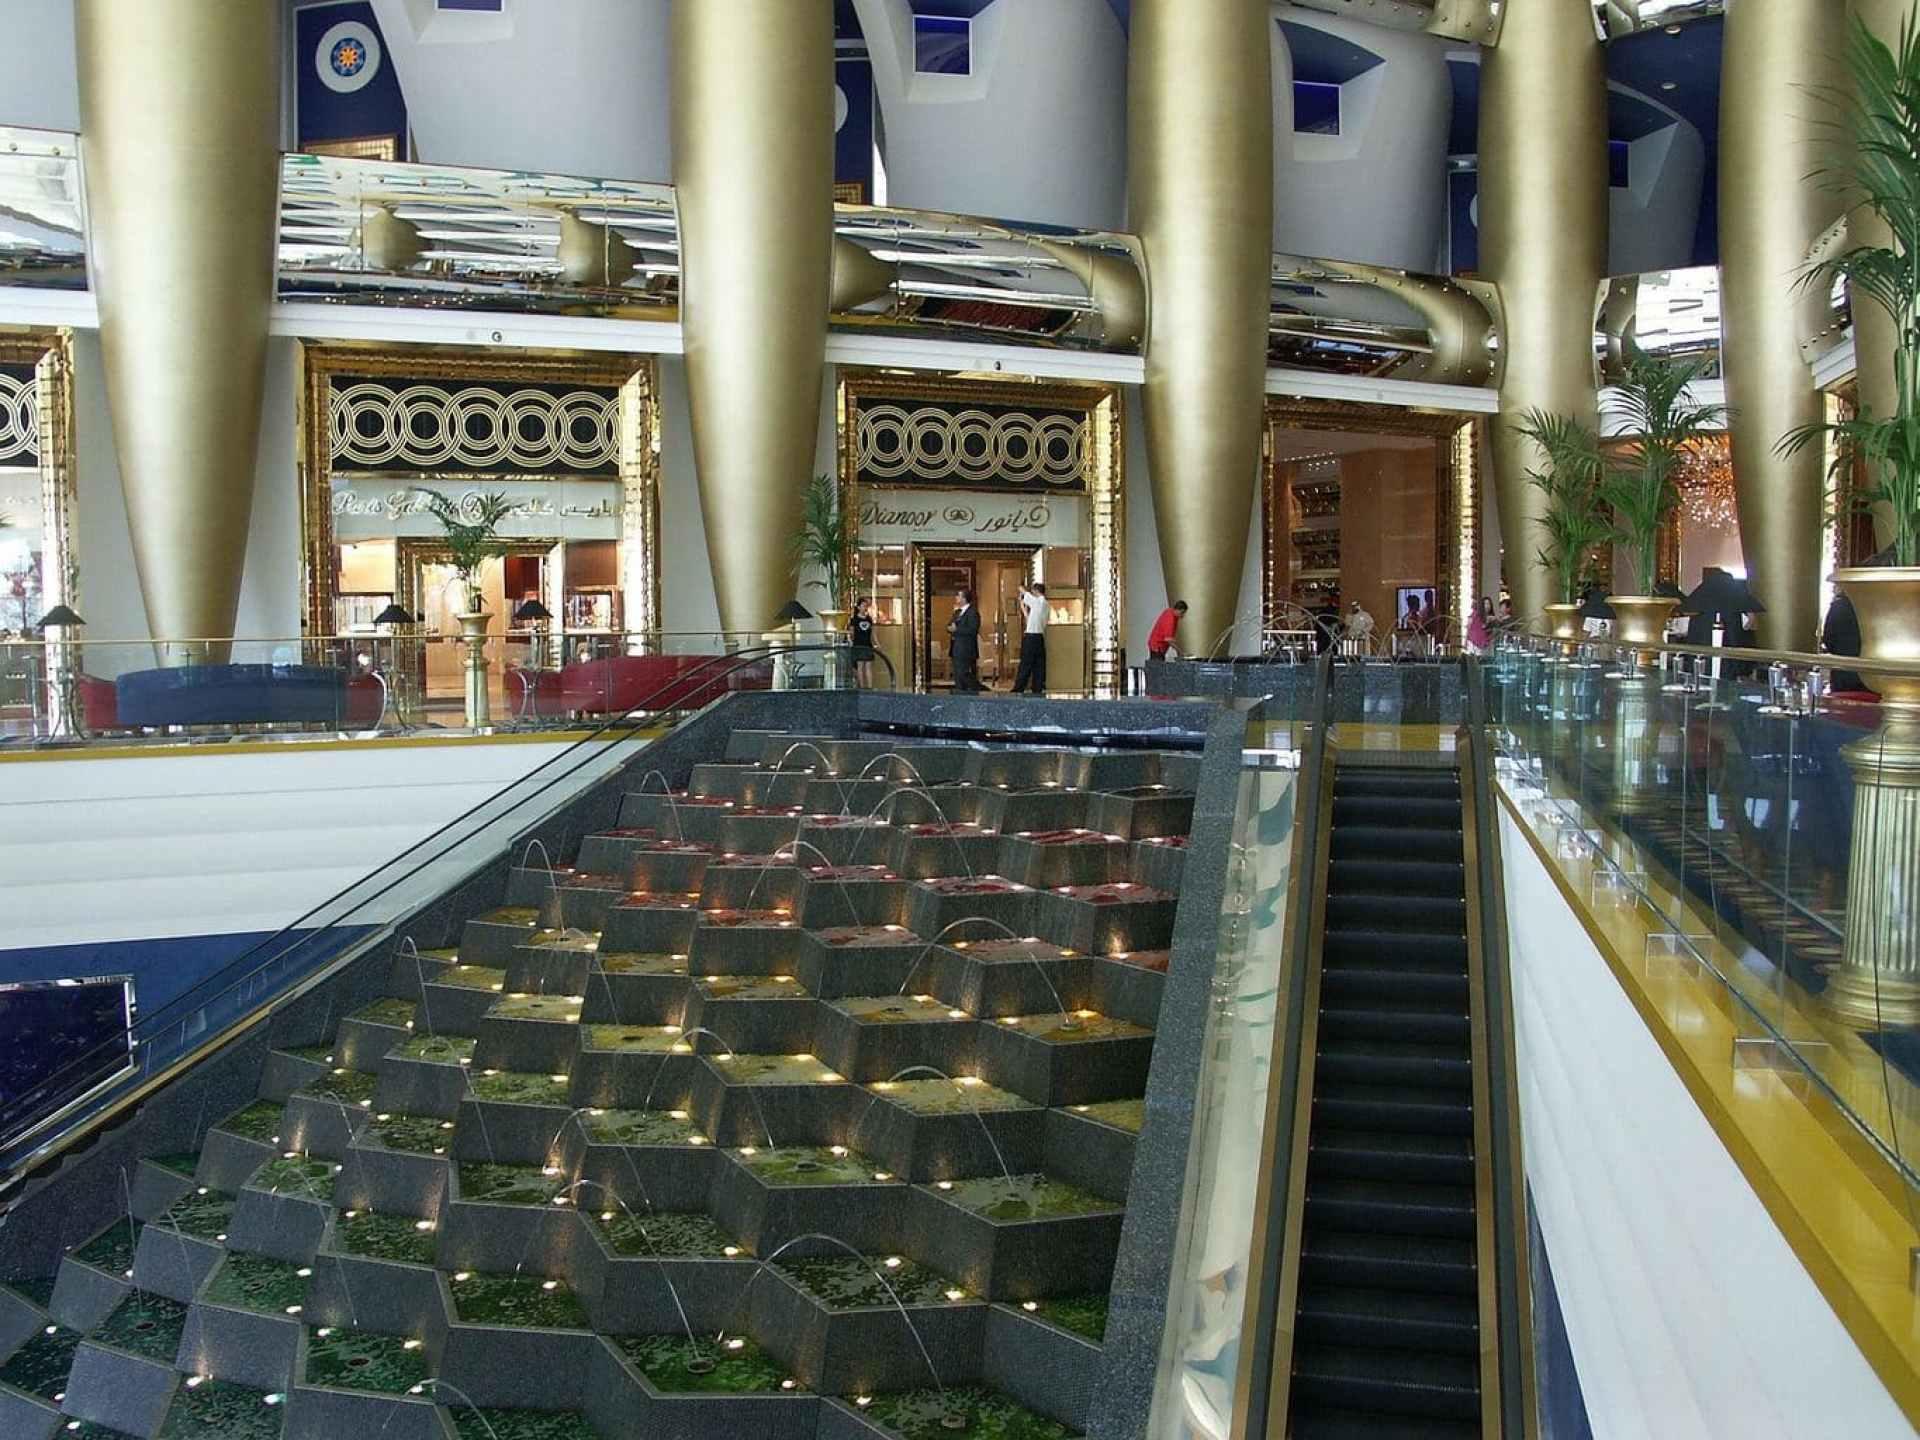 The lobby at the Burj Al Arab